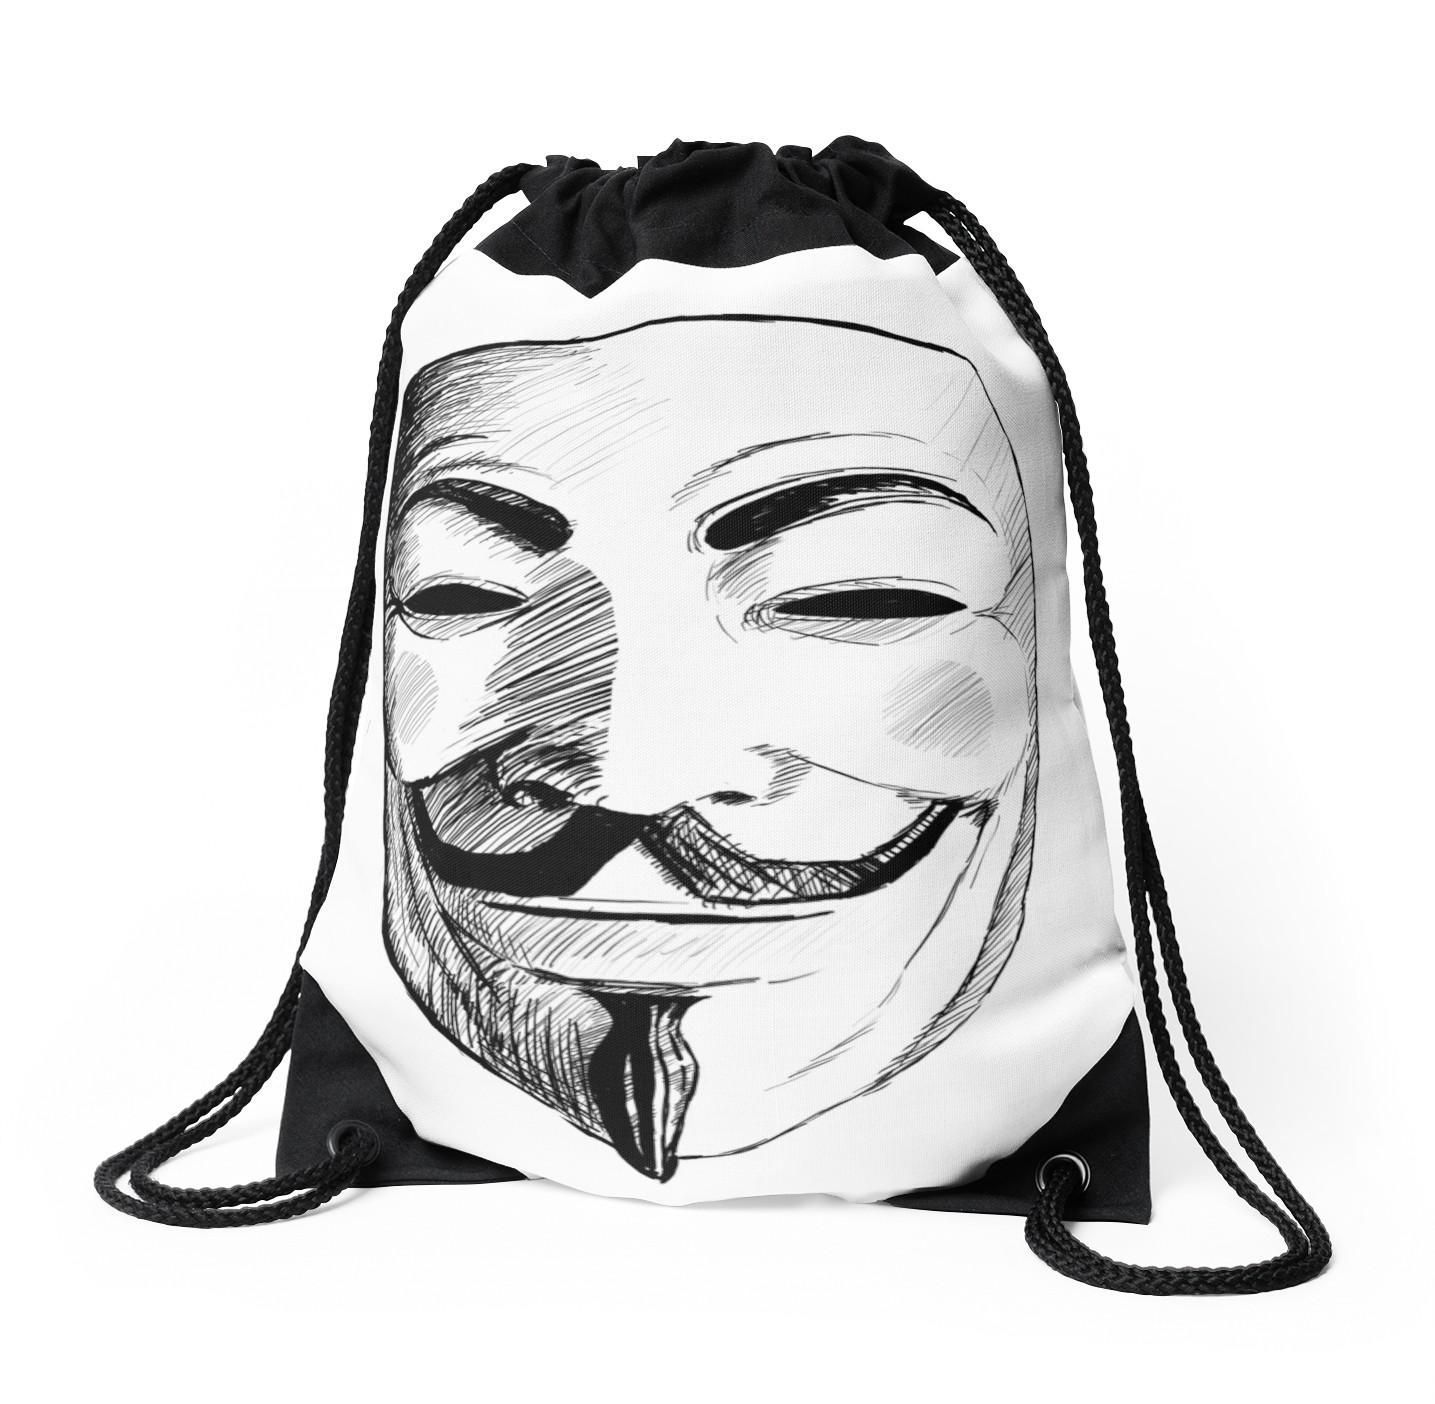 1435x1404 V For Vendetta Drawstring Bags By Thorigor Redbubble